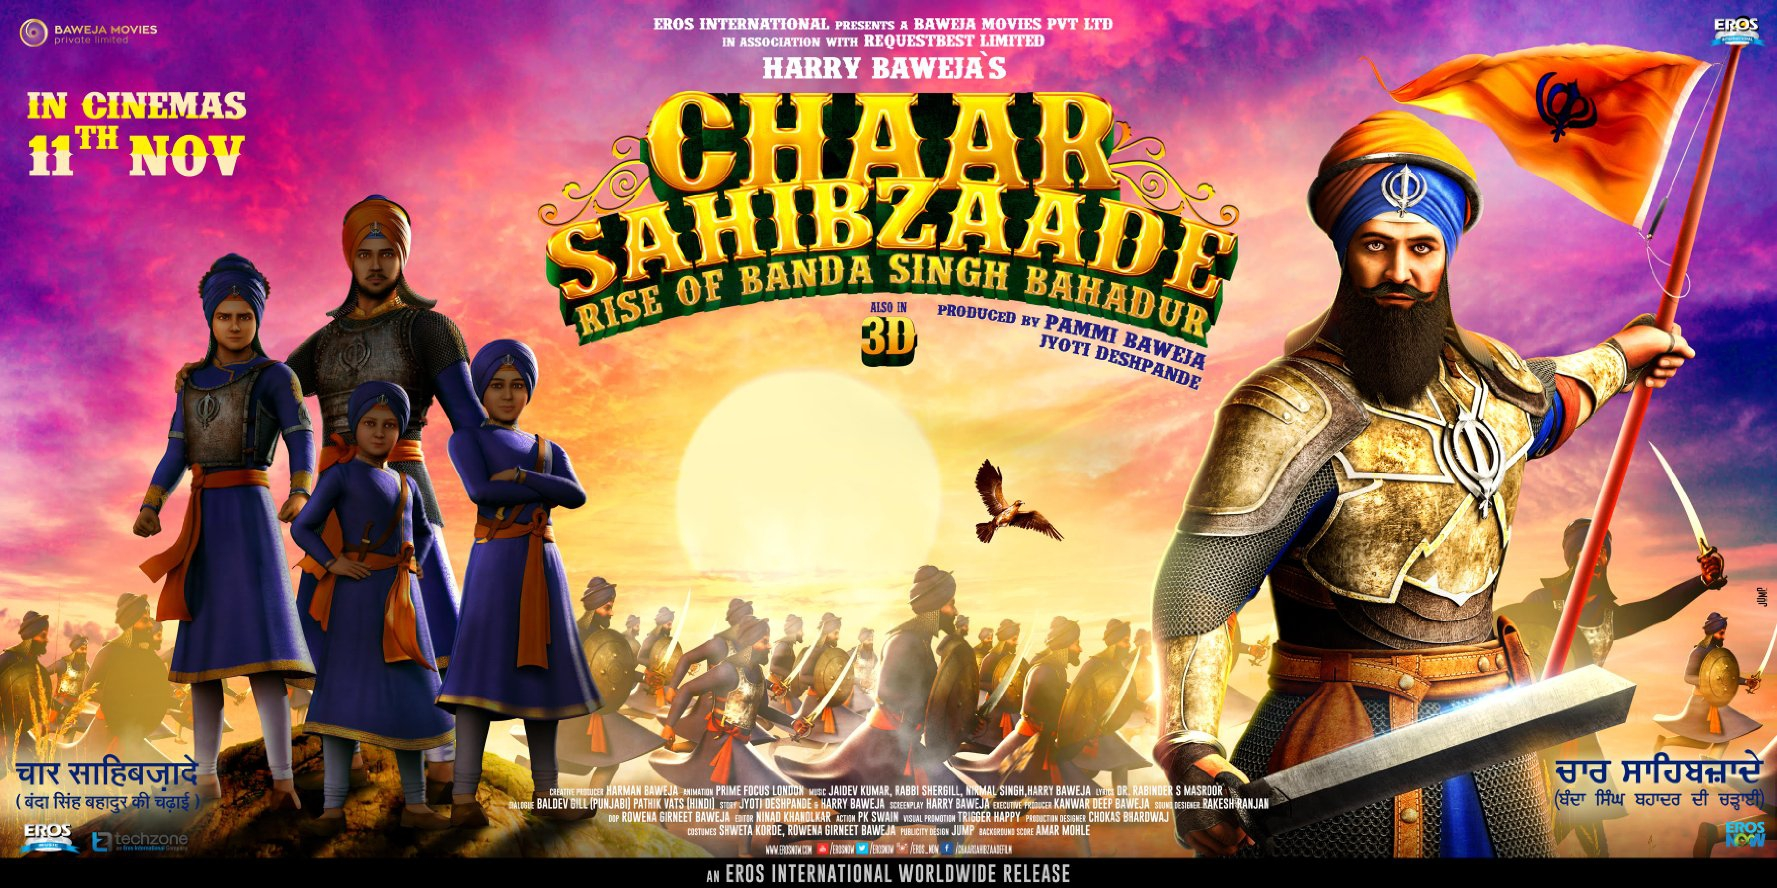 Chaar Sahibzaade 2: Rise of Banda Singh Bahadur (2016)